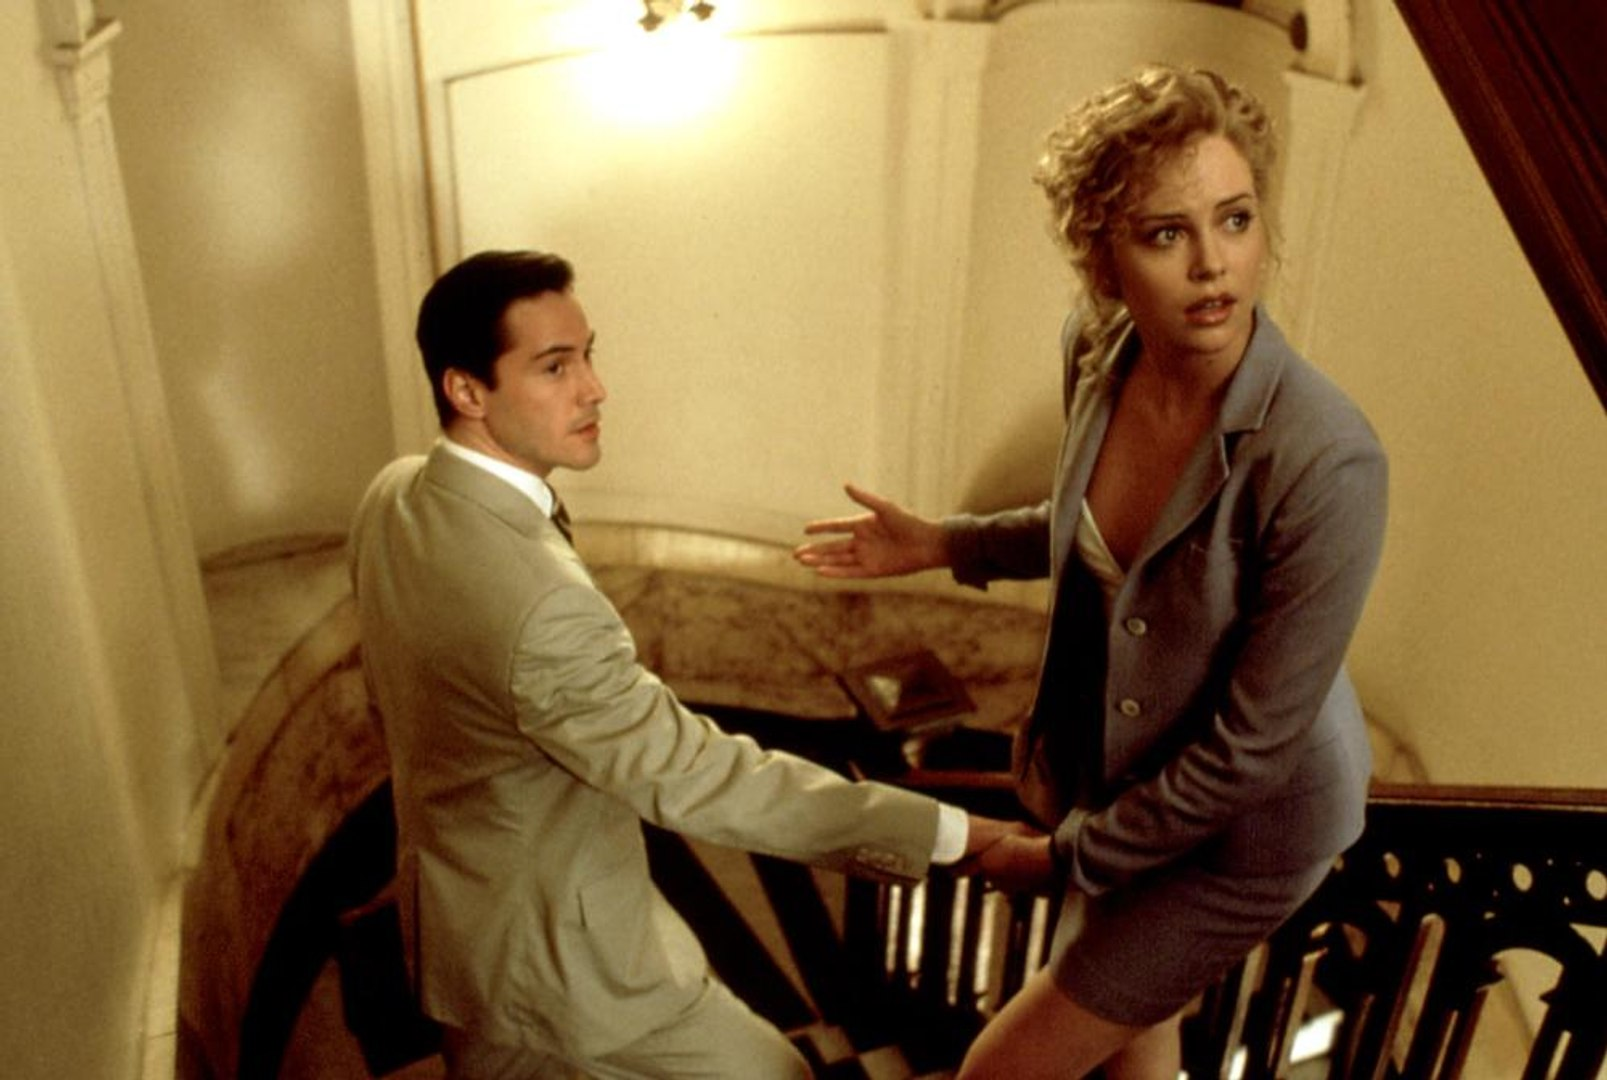 Адвокат дьявола (The Devil's Advocate) 1997